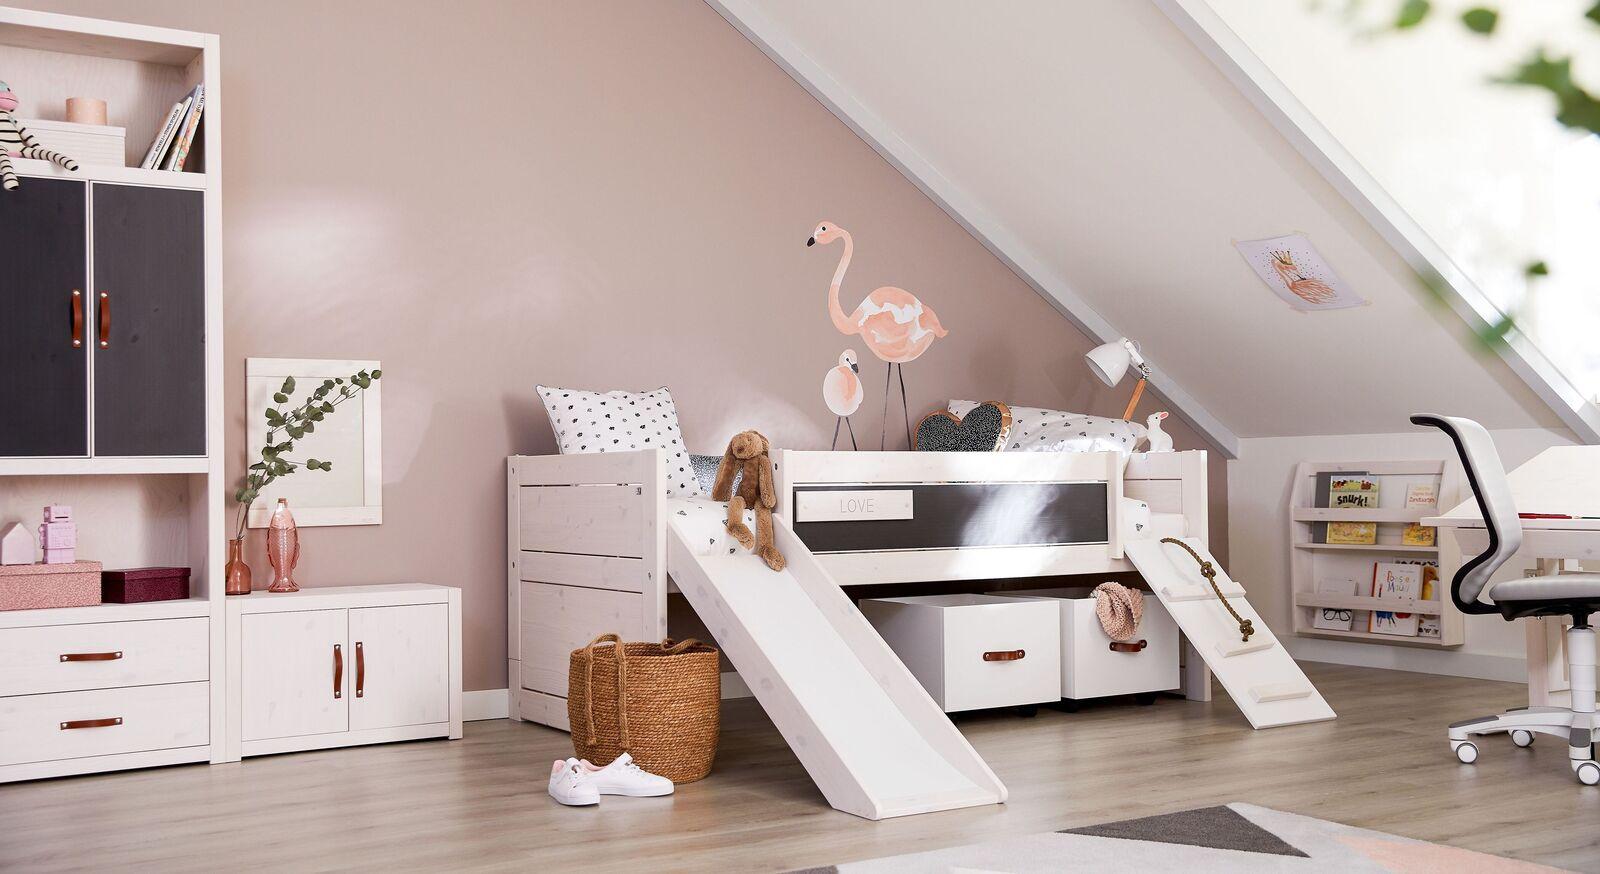 LIFETIME Kojenbett Climmb & Slide für moderne Kinderzimmer